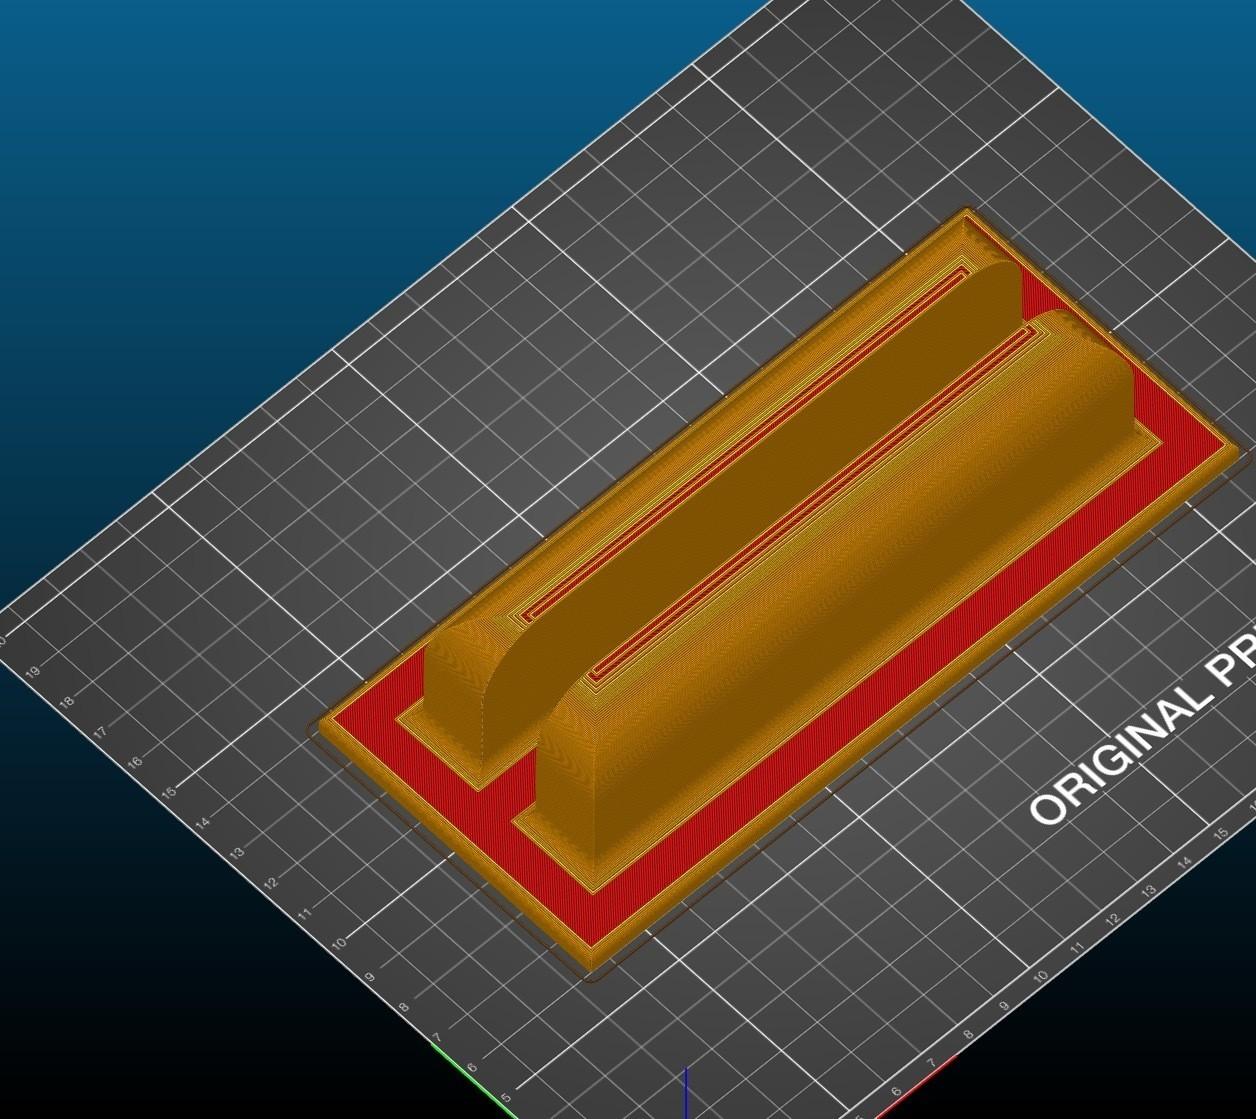 Capture d'écran 2018-09-23 à 17.24.50.jpg Download free STL file Macbook Retina support • 3D printing template, plopjlf